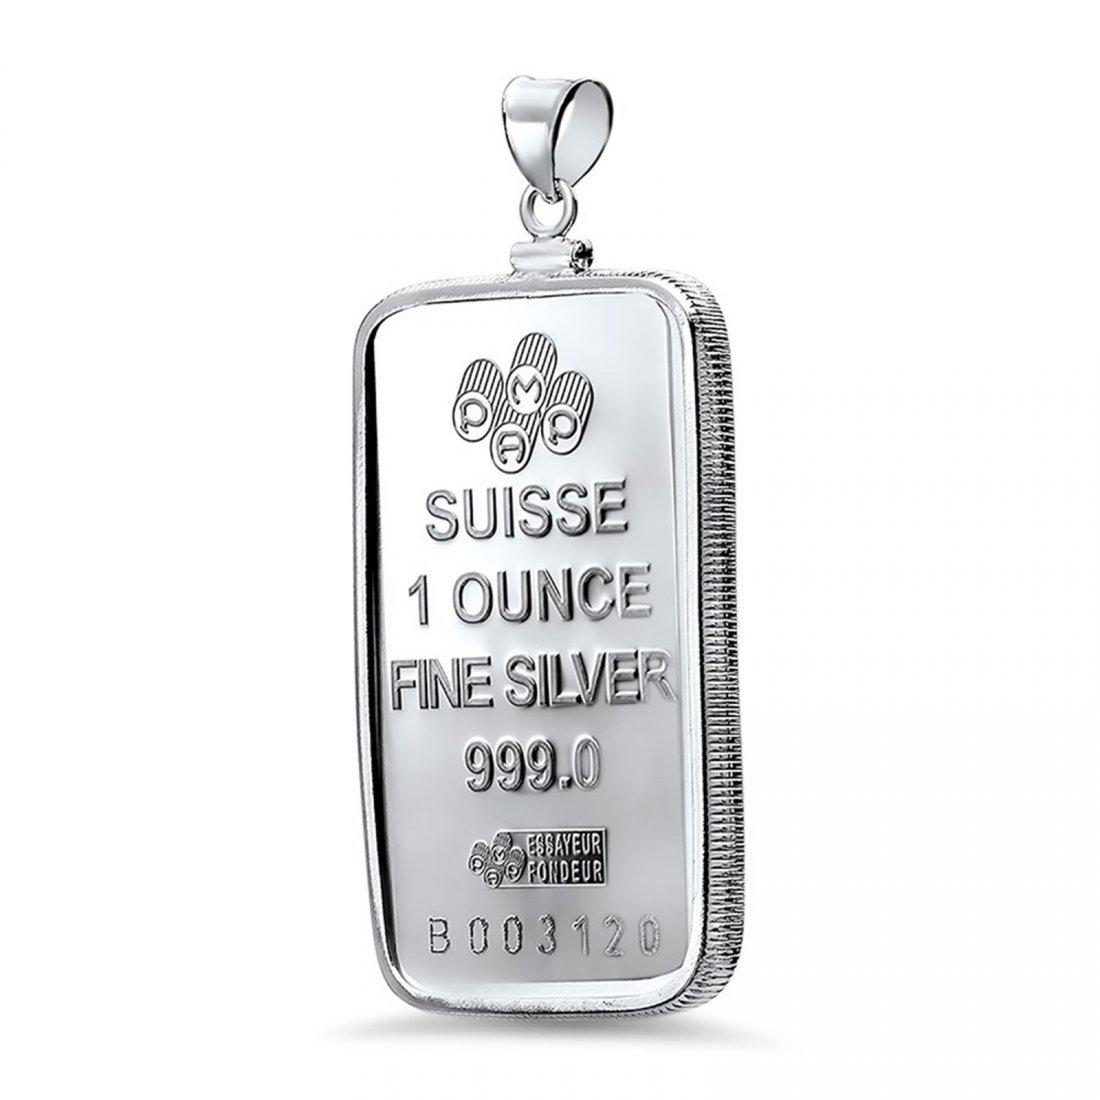 1 oz Silver Bar - Pamp Suisse Pendant (Fortuna) - 2